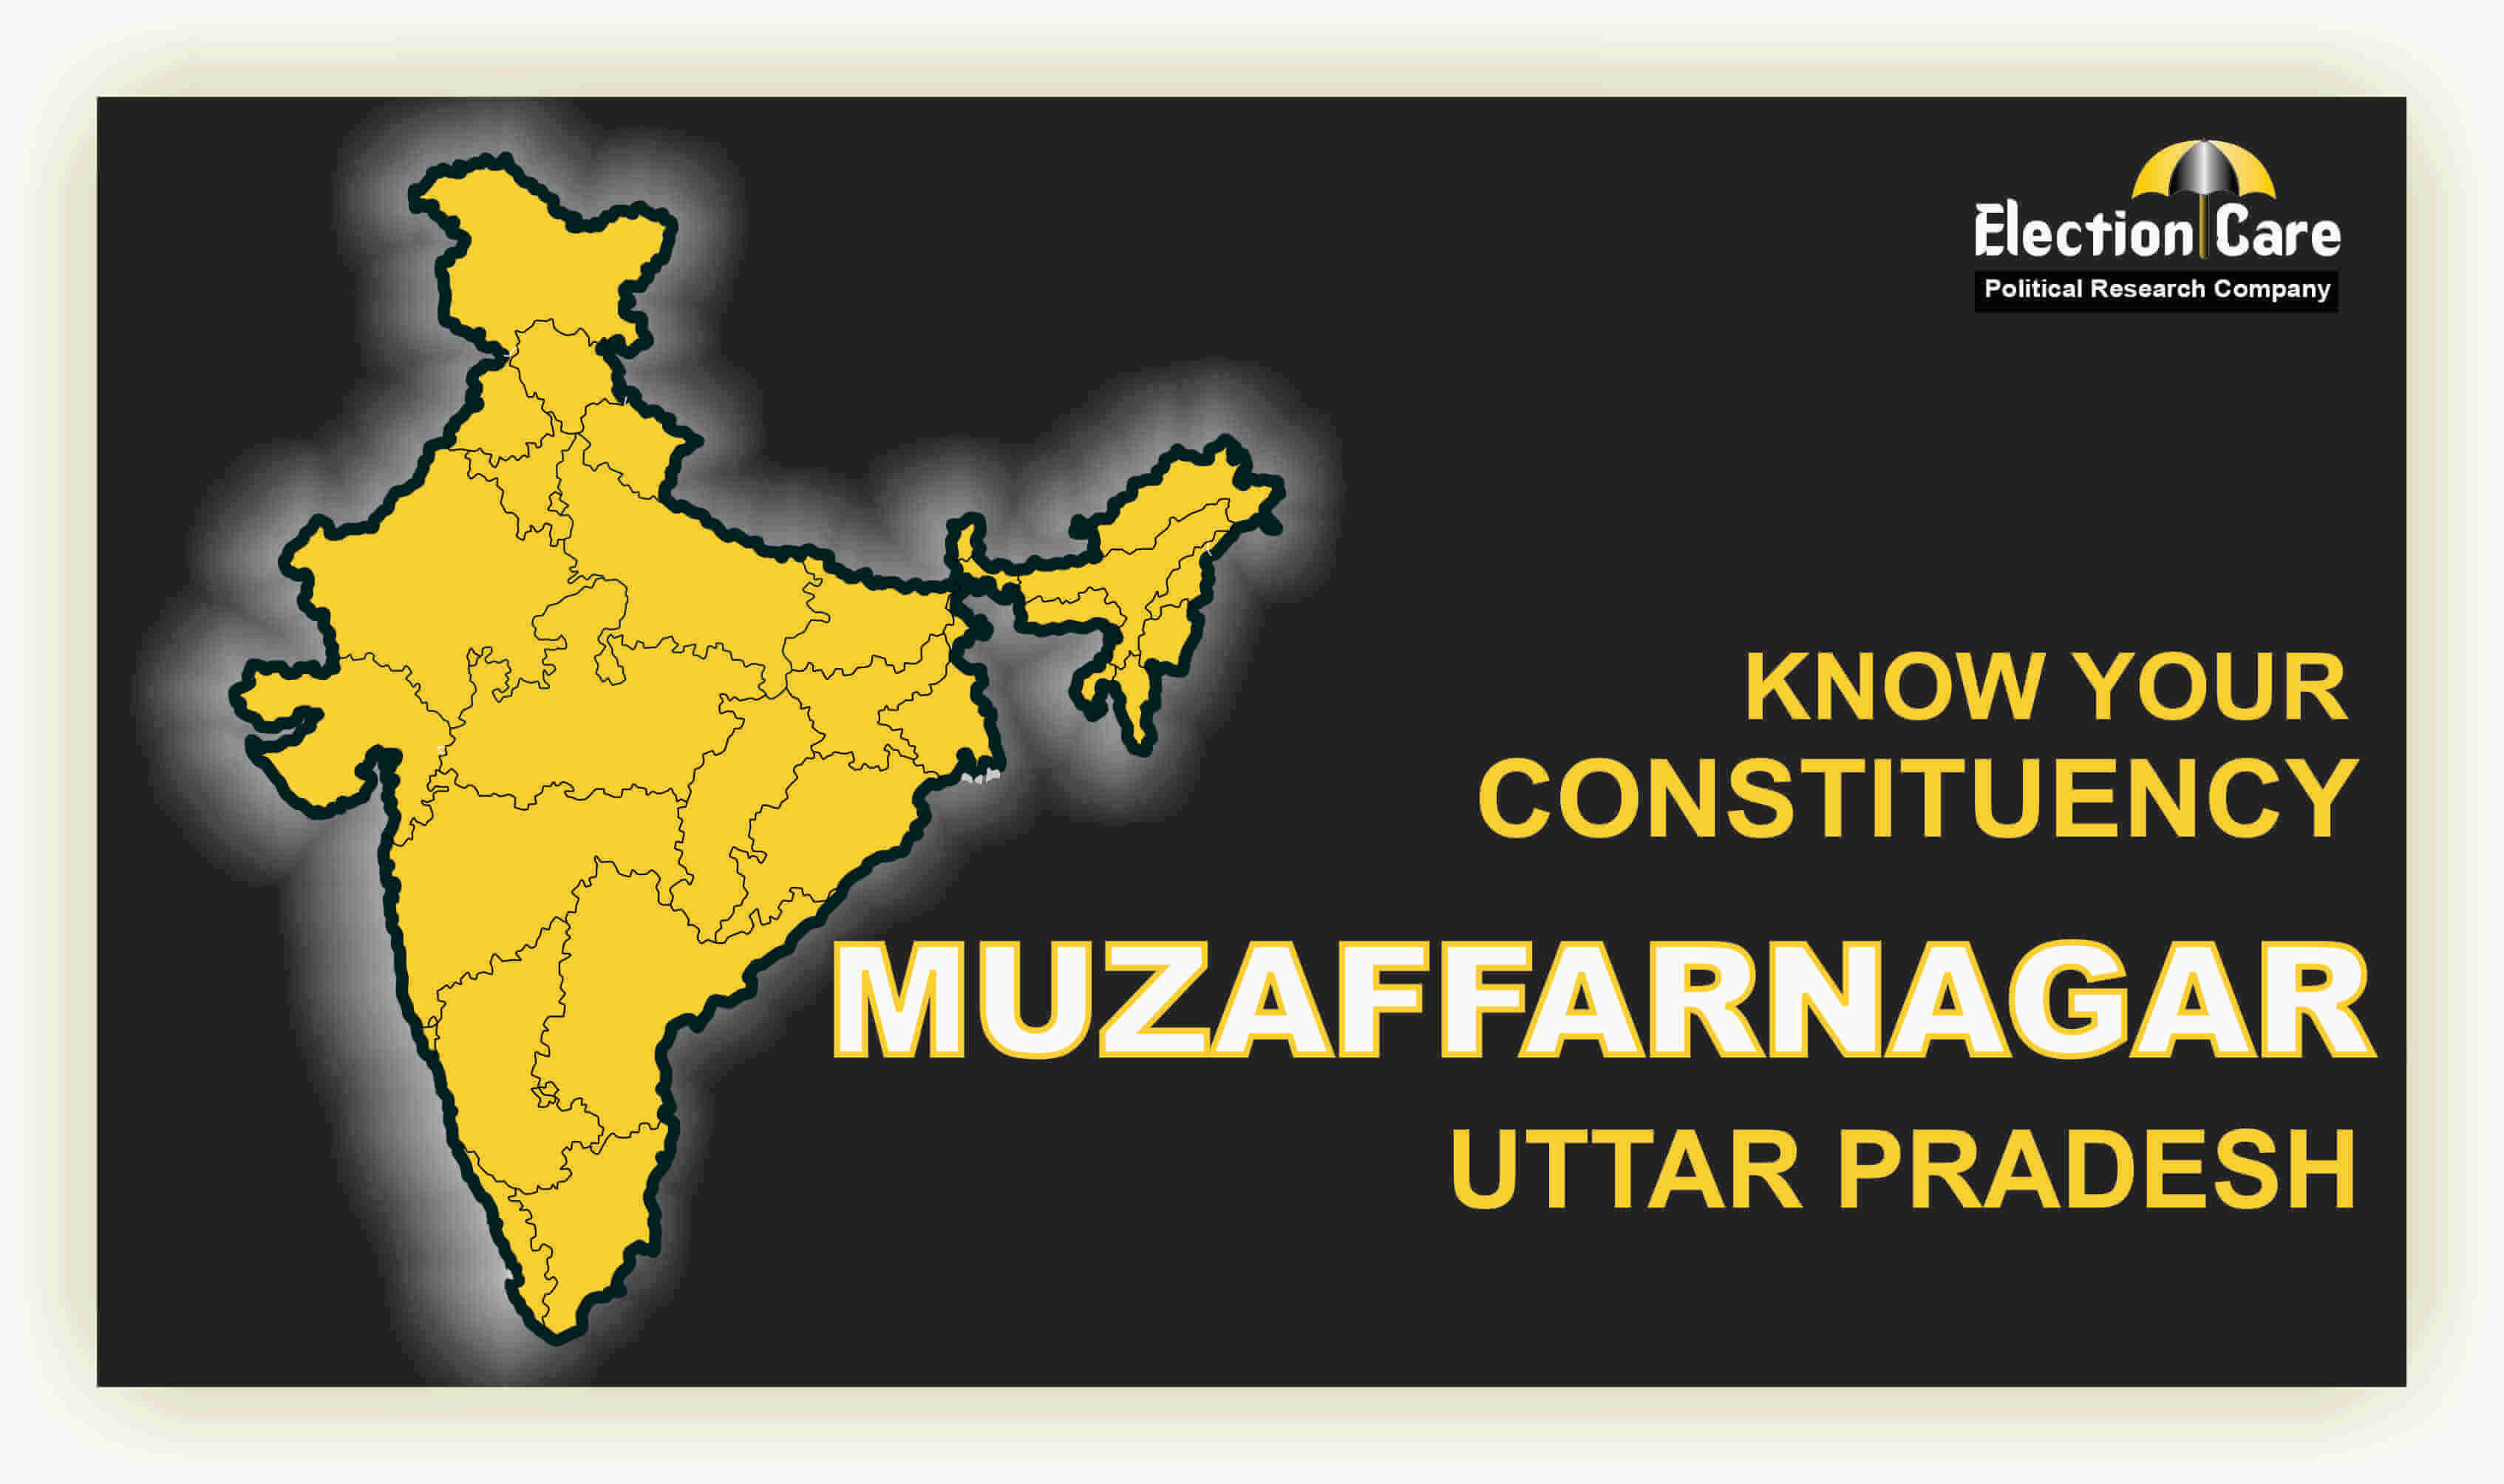 Muzaffarnagar Parliament Election Result